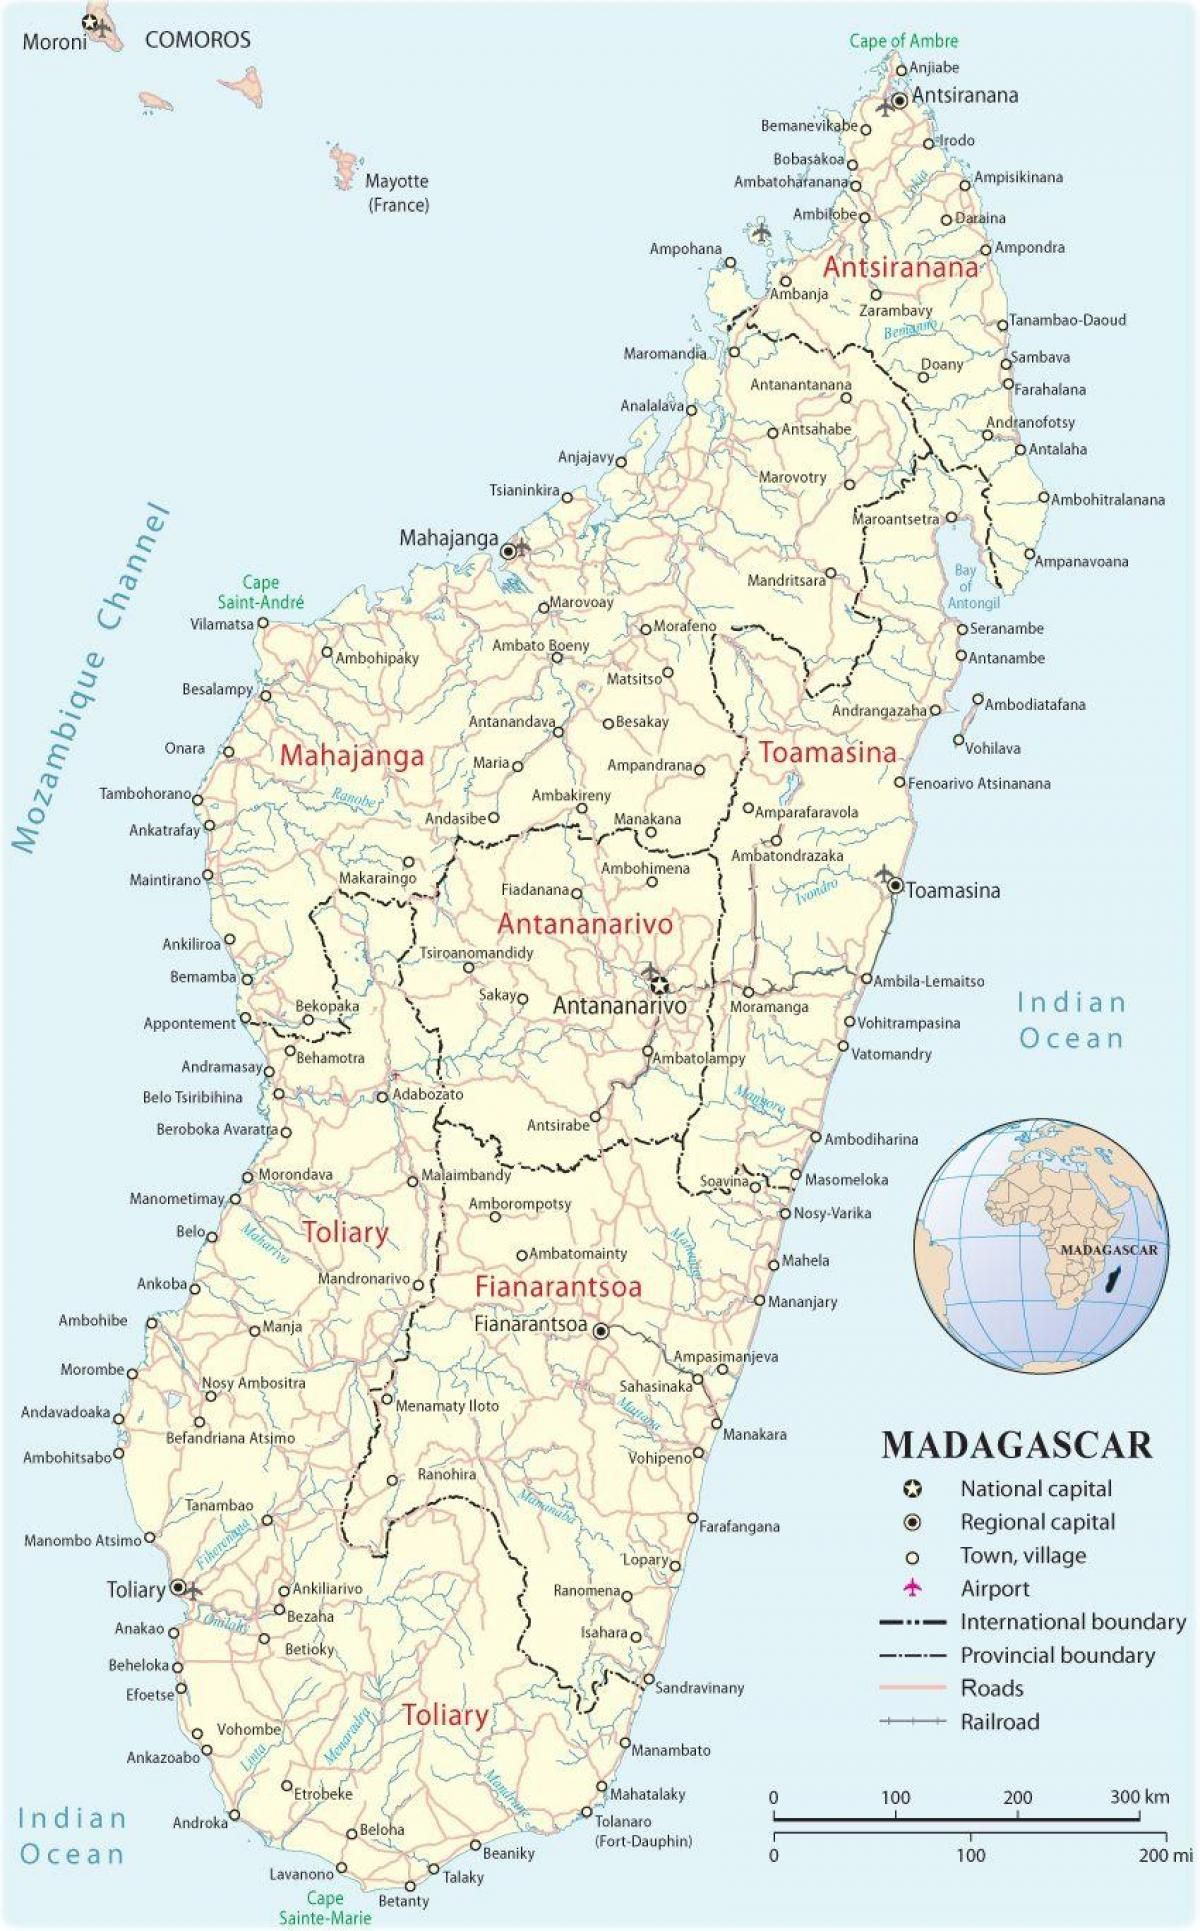 Madagascar Aeropuertos Mapa Mapa De Madagascar Aeropuertos